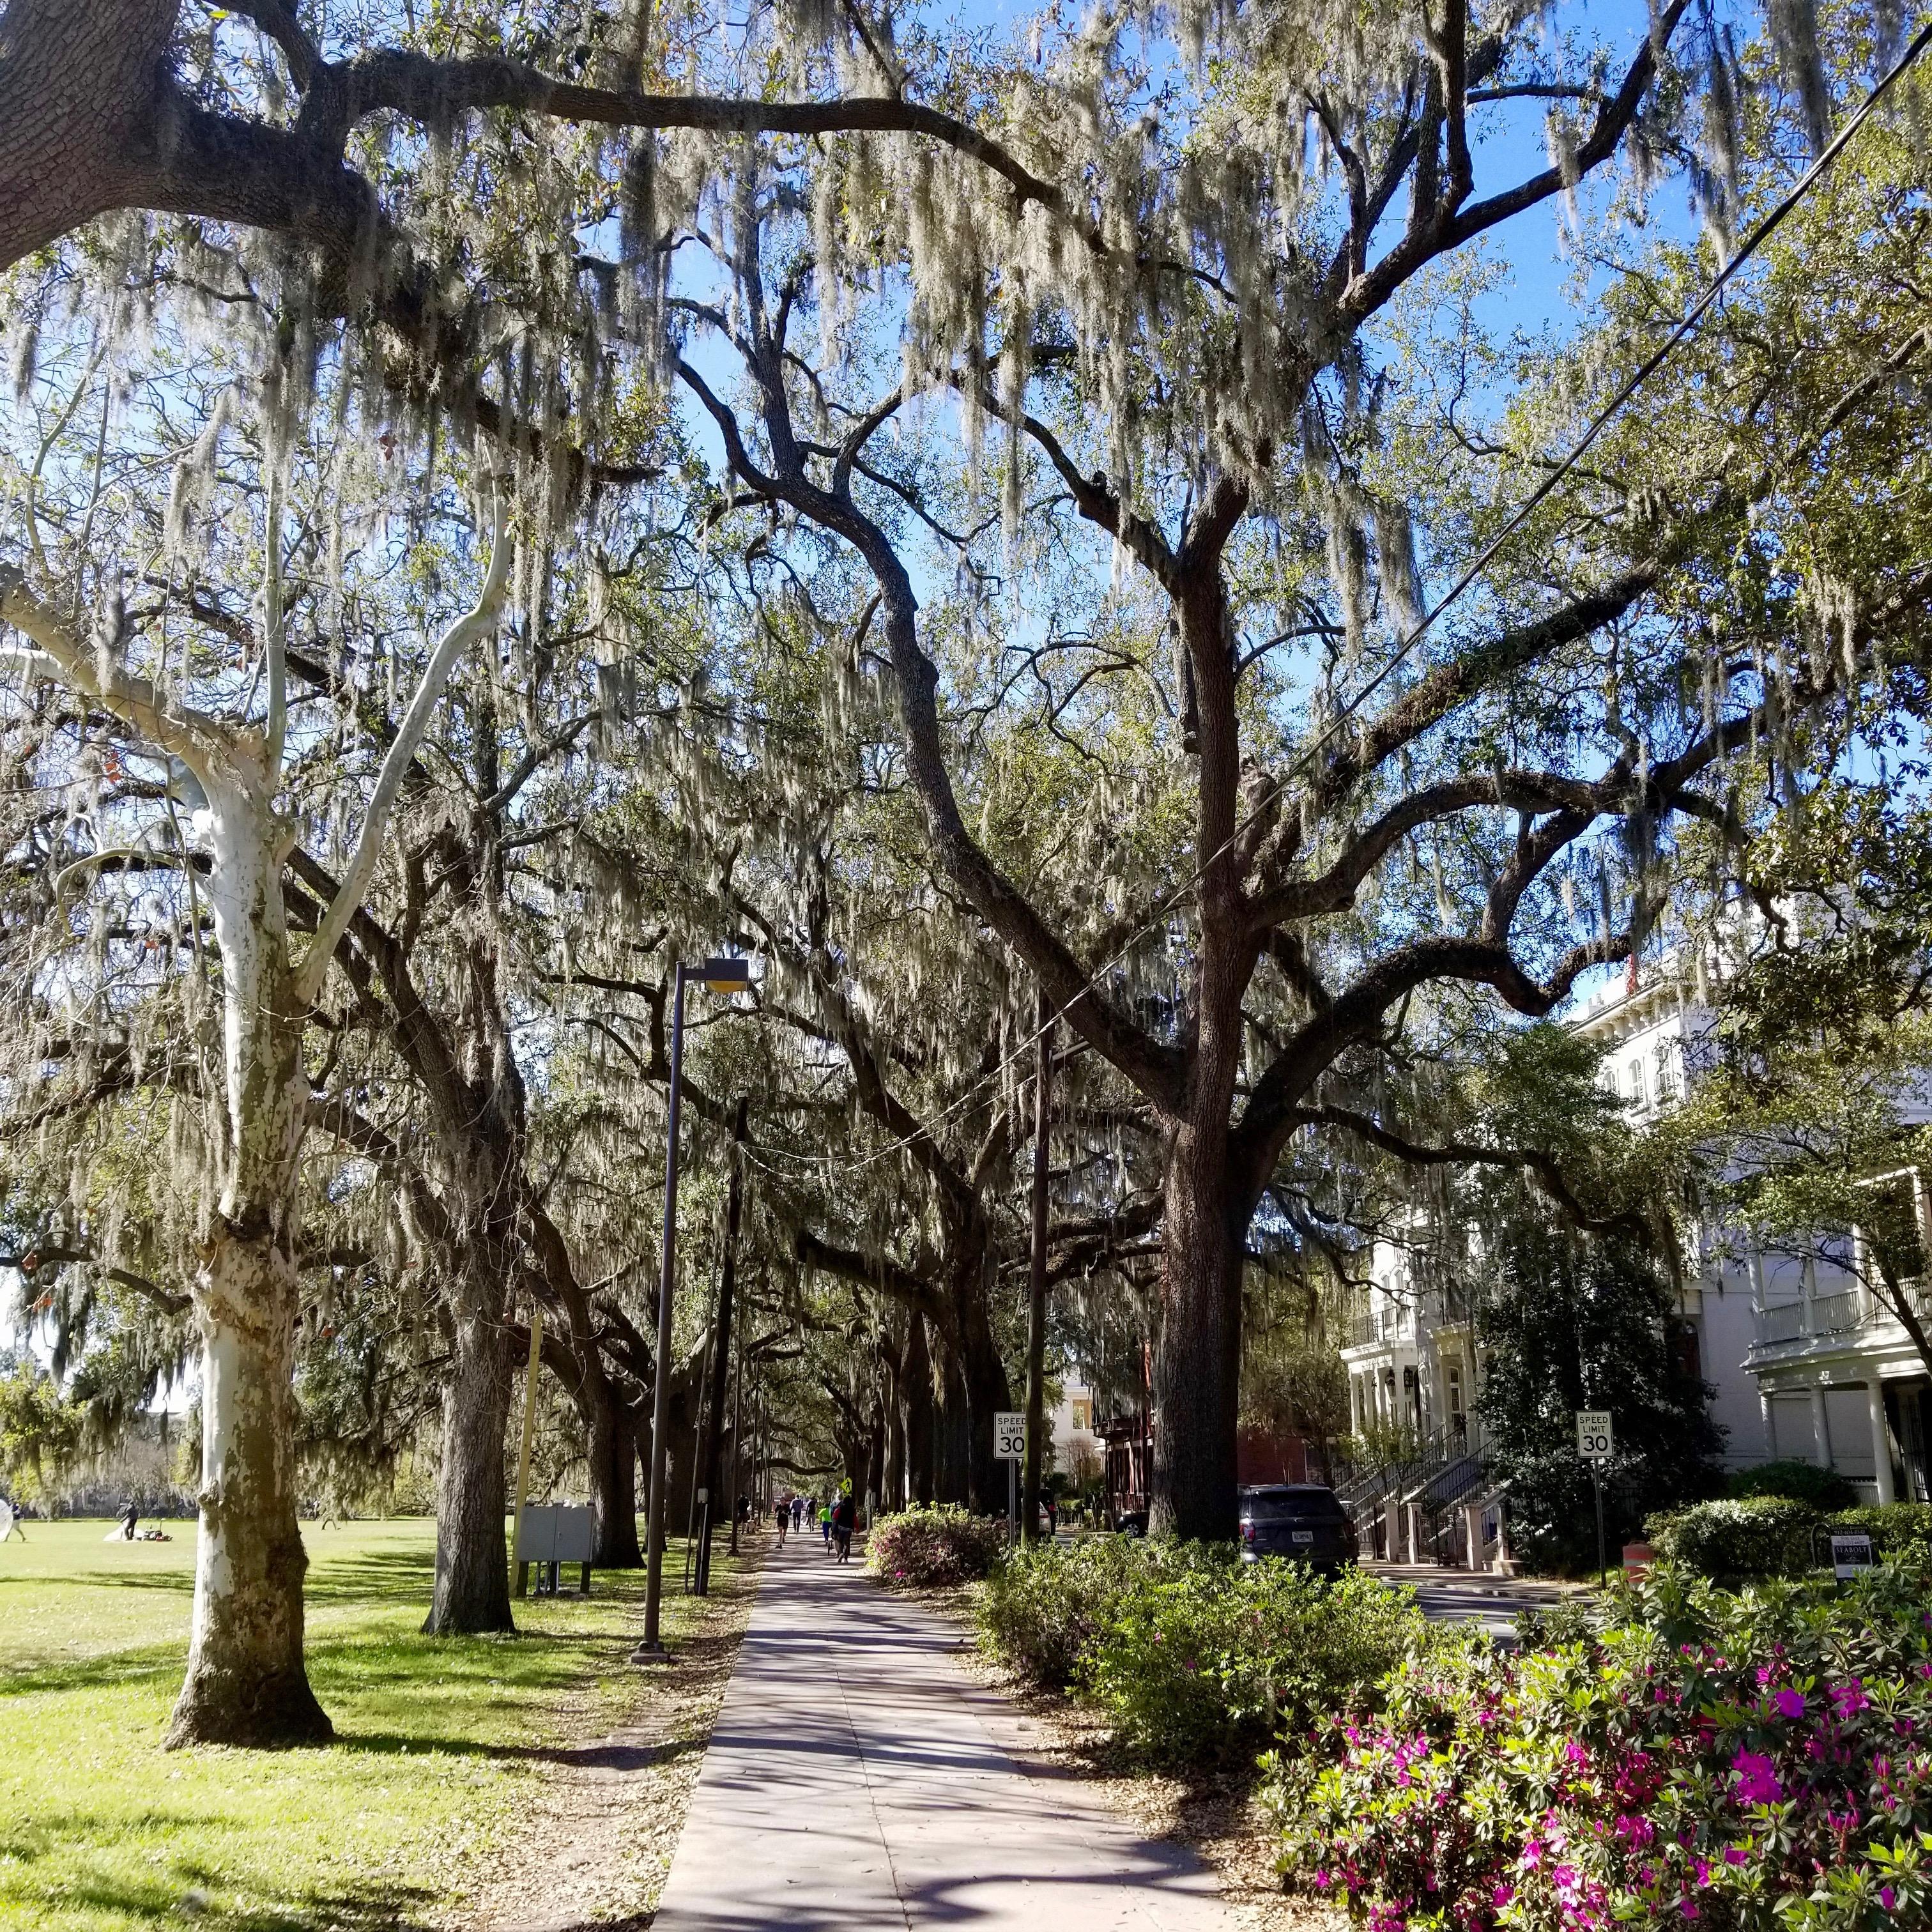 trees in forsyth park savannah